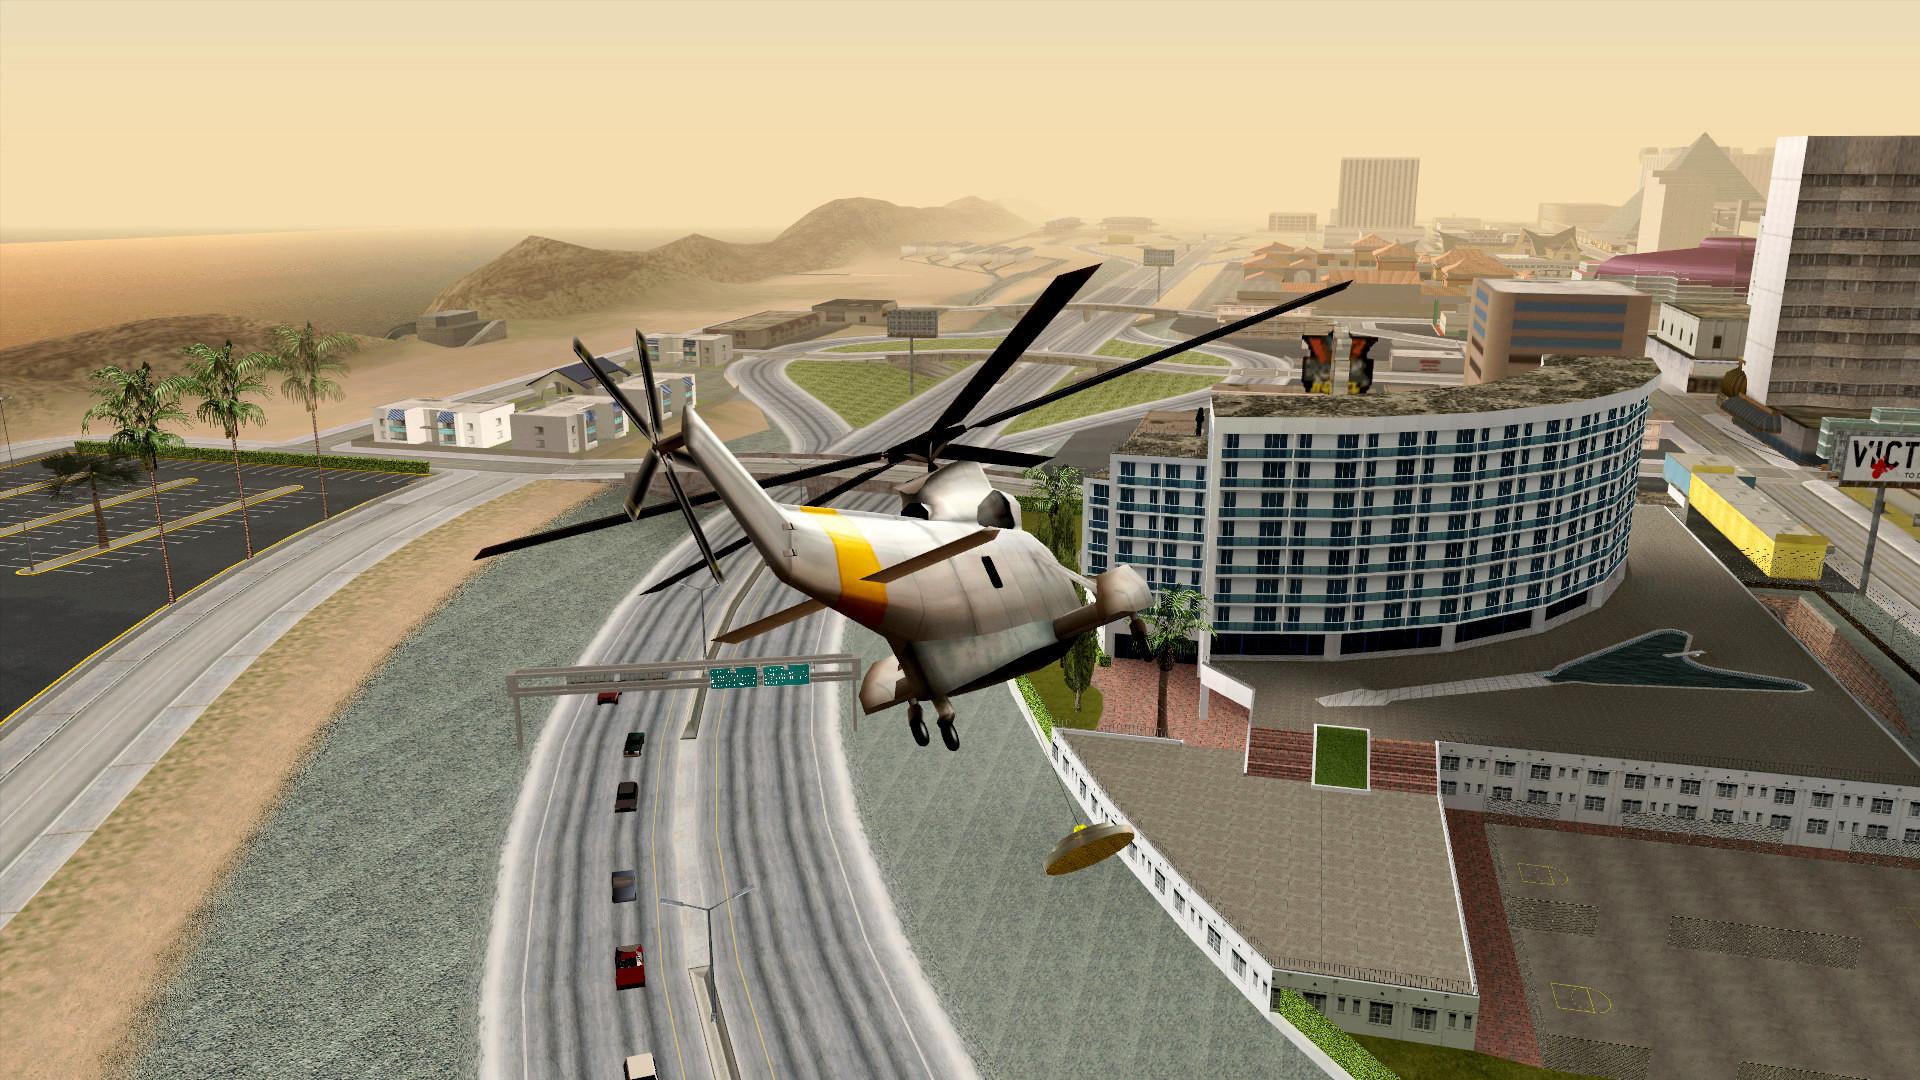 gta_sa 2016-05-17 20-09-29-70.jpg - Grand Theft Auto: San Andreas